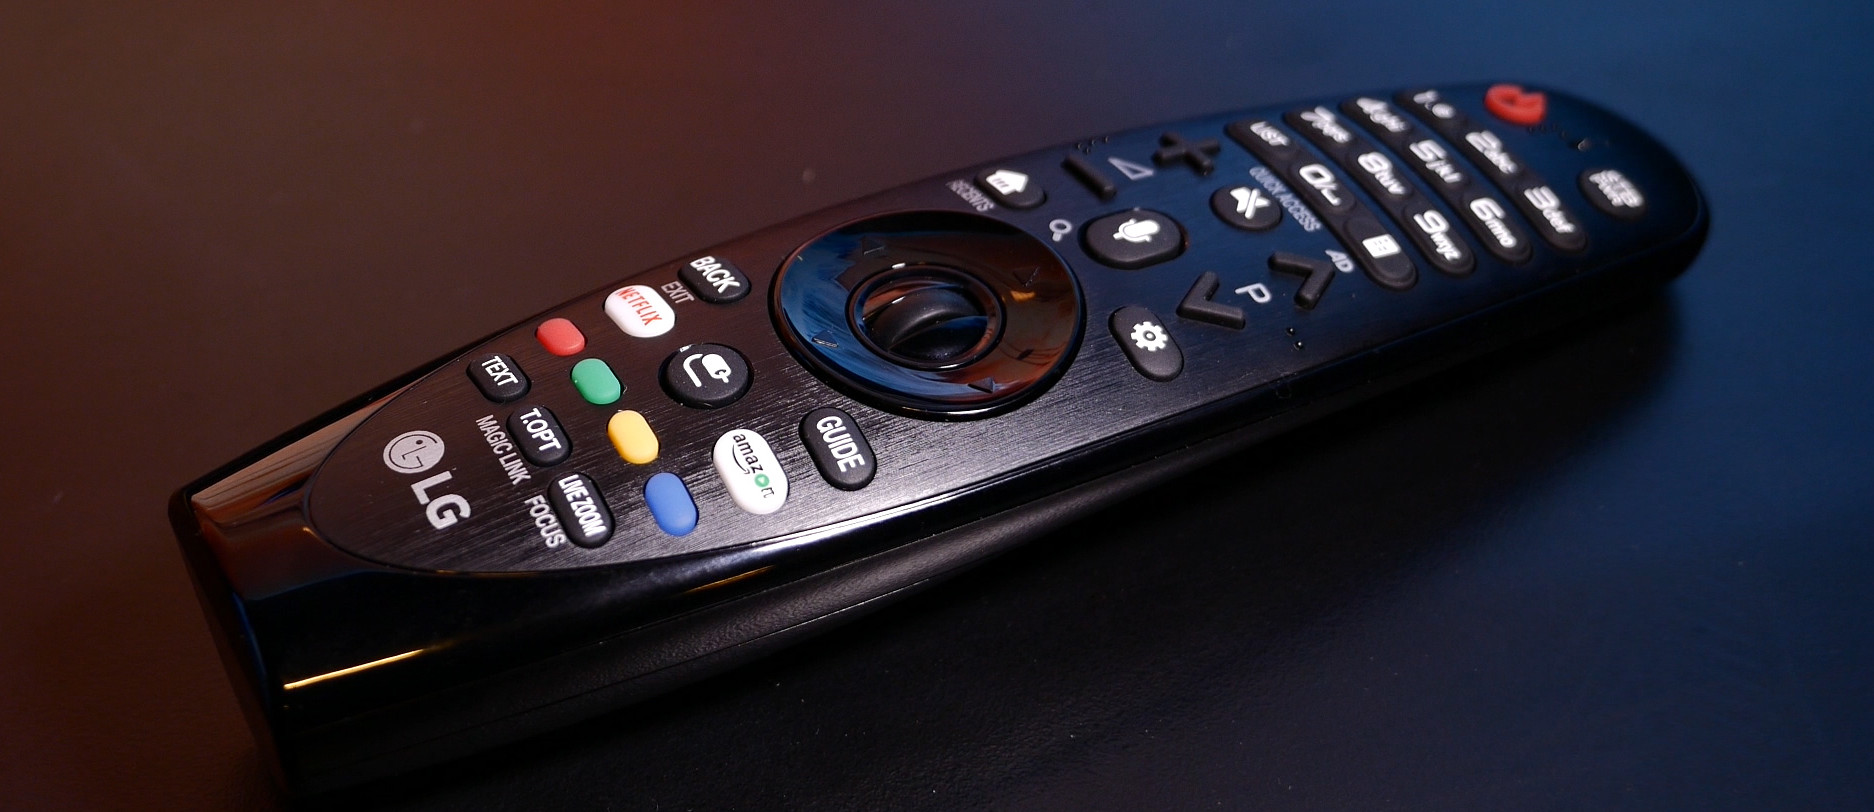 LG OLED55B7V (B7) OLED TV Review